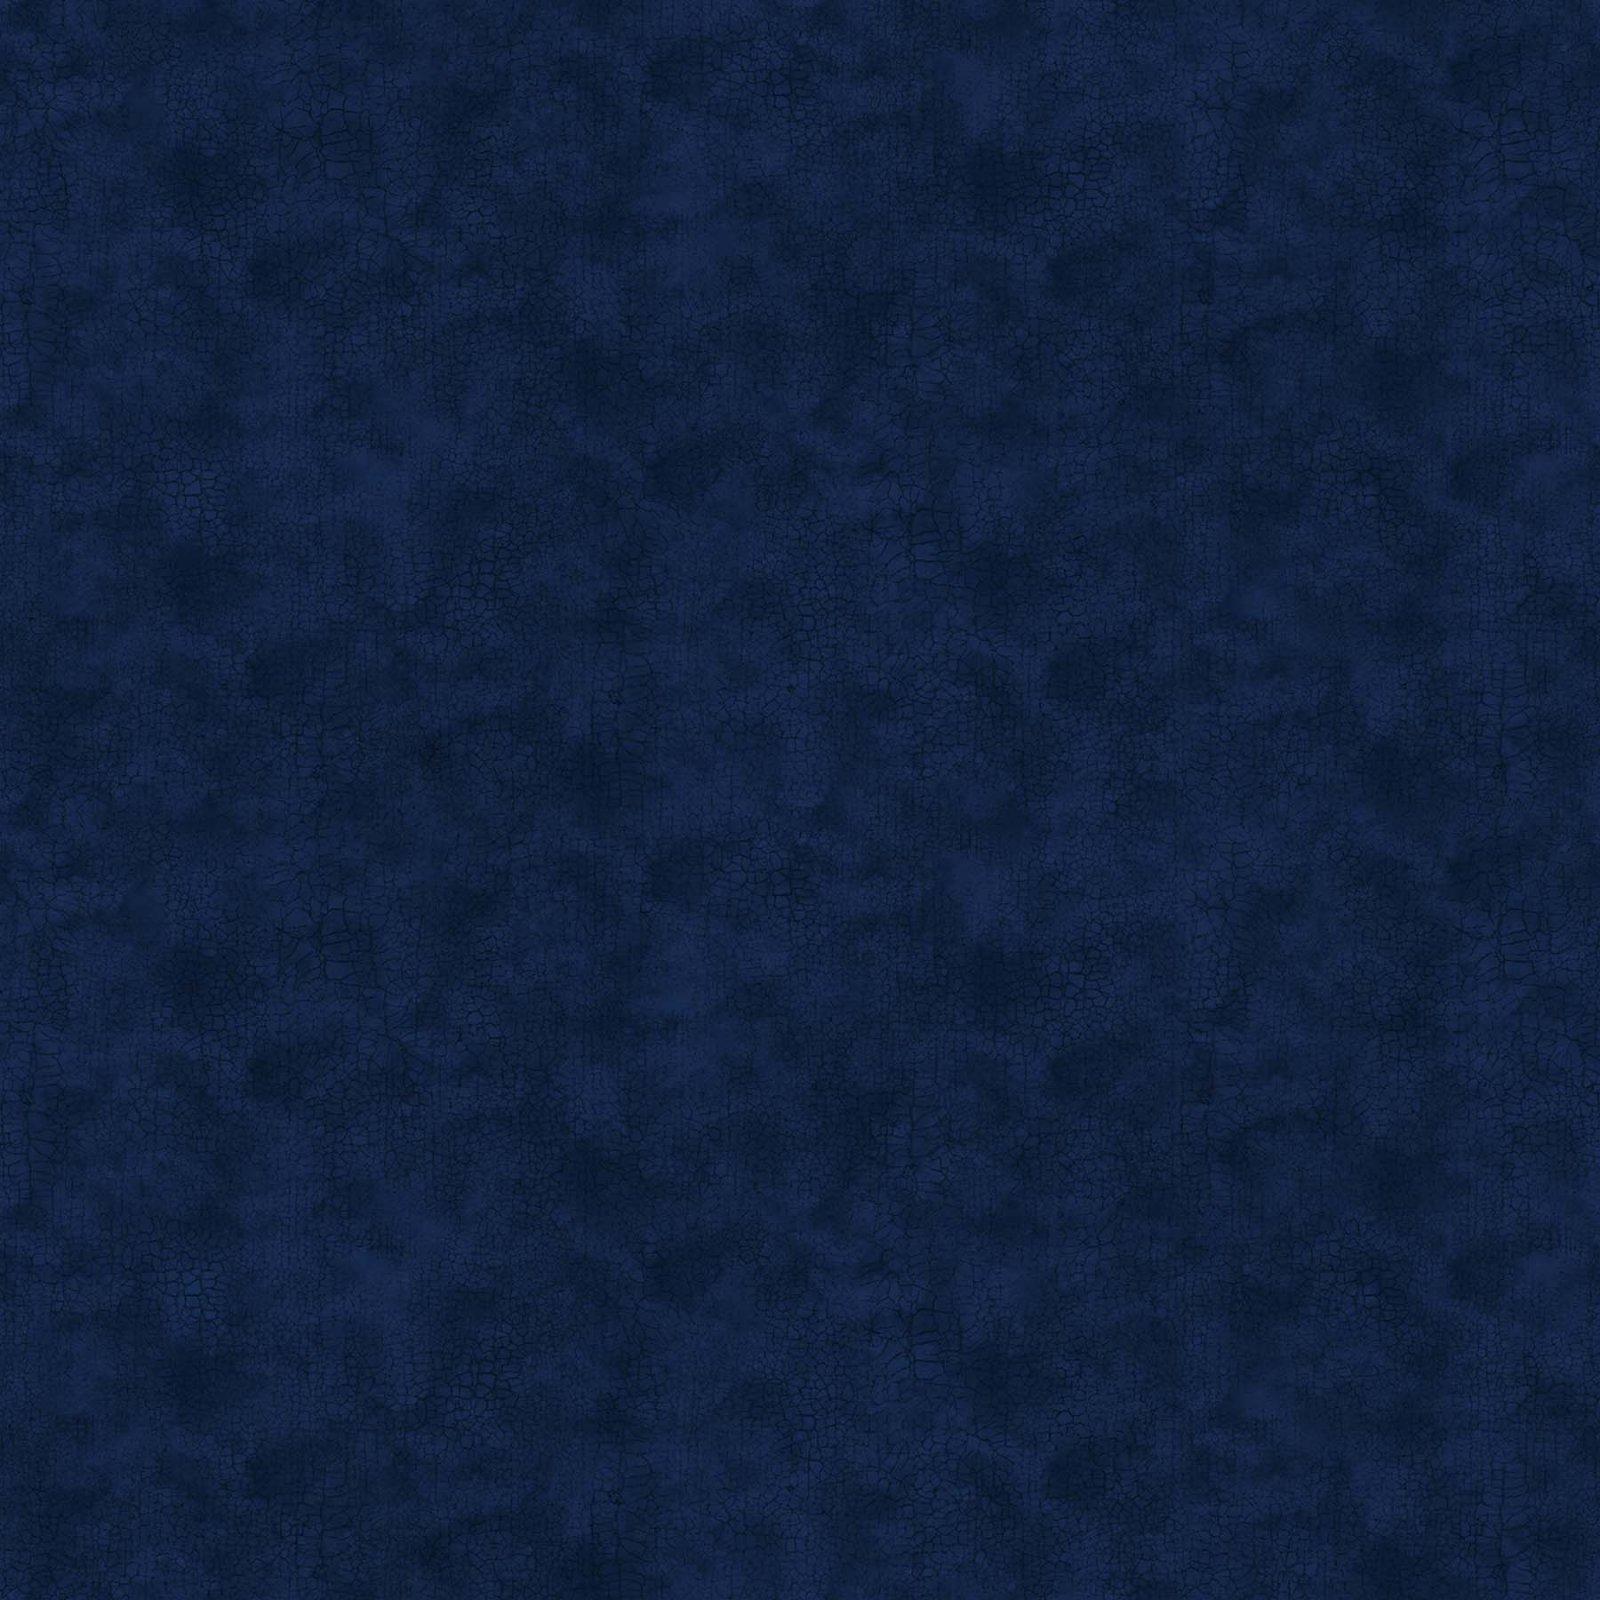 F-N-9045 49 Midnight Crackle